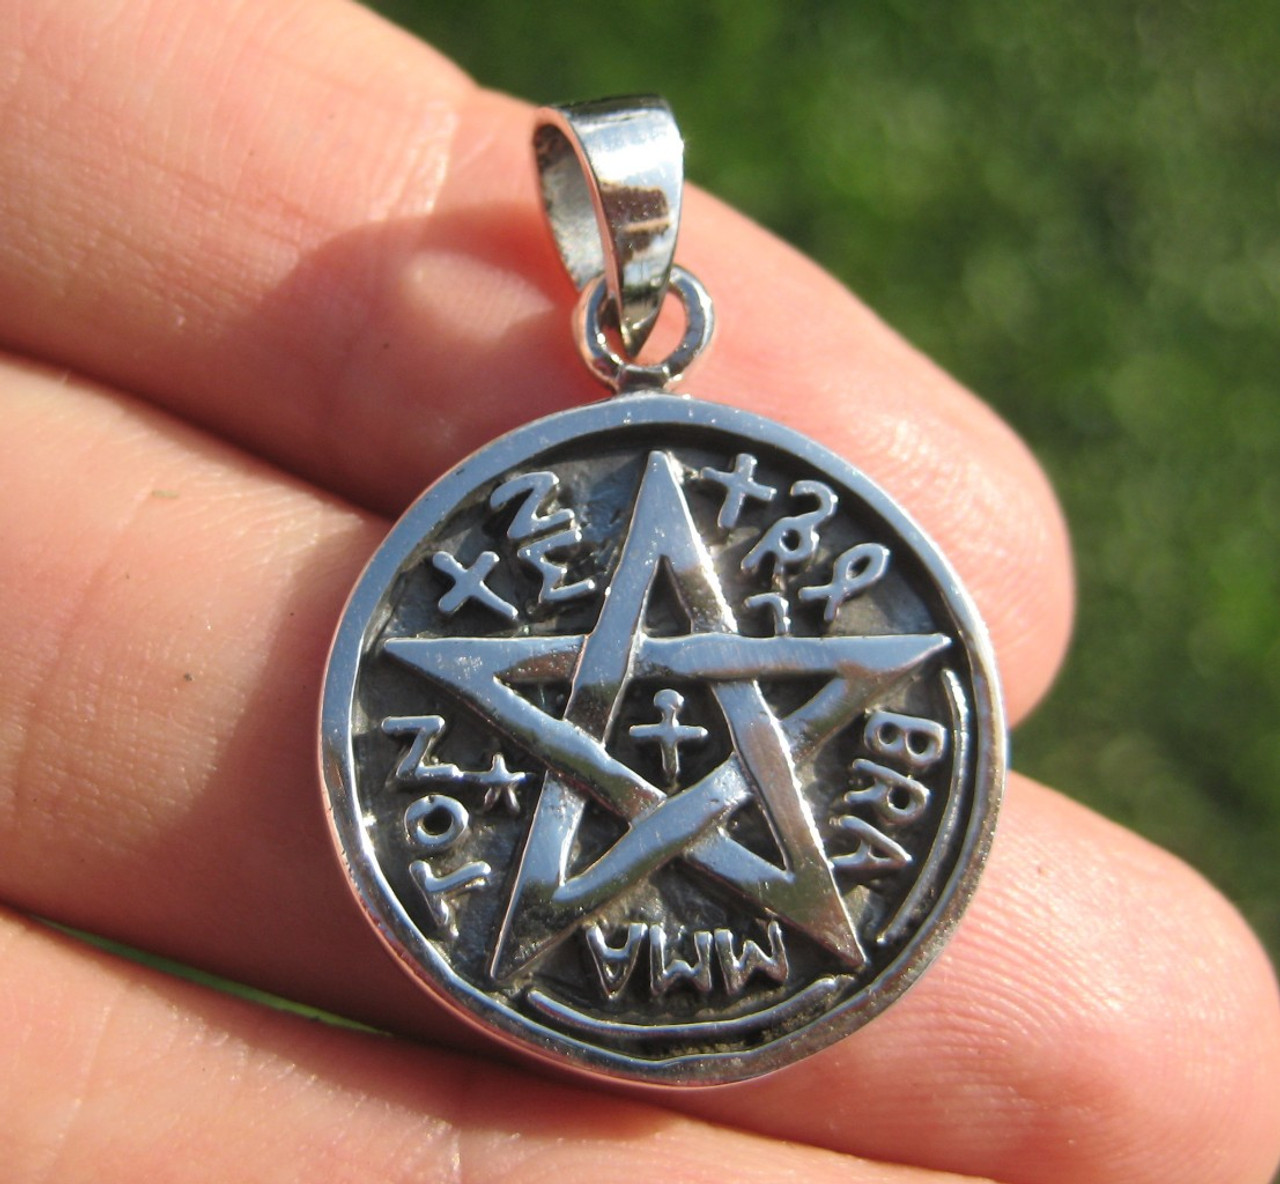 925 sterling silver wicca pentagram pendant necklace a42 everest 925 sterling silver wicca pentagram pendant necklace a42 aloadofball Choice Image